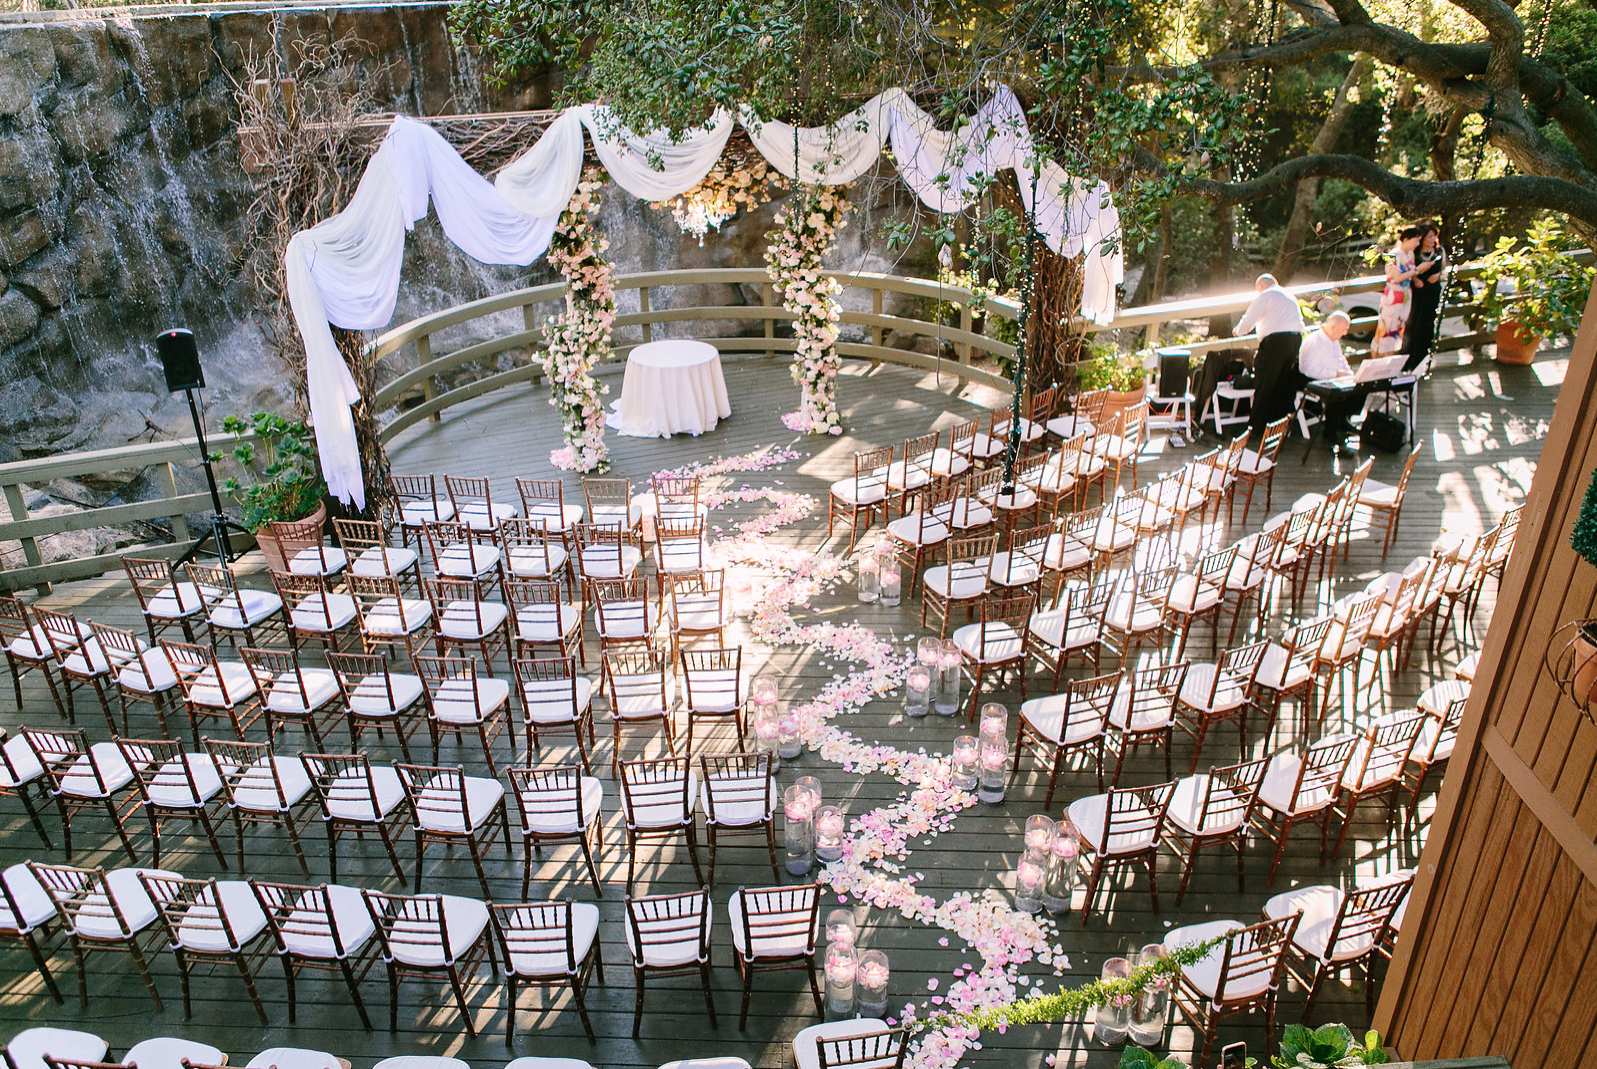 The Oak Room At Calamigos Ranch Pc Brianleahyphoto Calamigos Ranch Wedding Calamigos Ranch Ranch Wedding